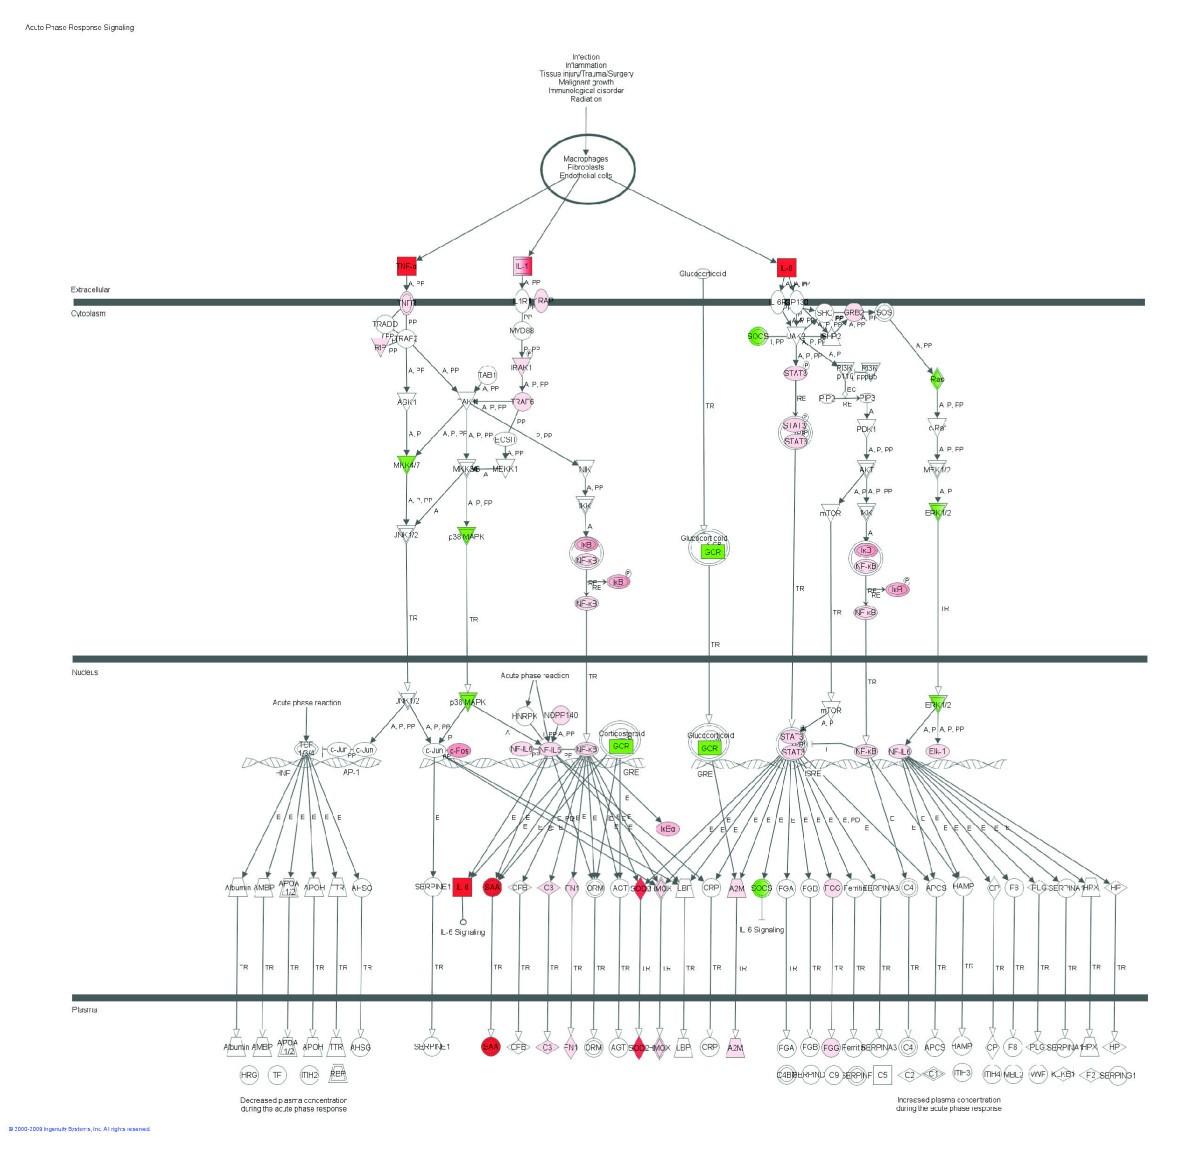 Gene Network And Pathway Analysis Of Bovine Mammary Tissue Ledcircuitcalculator Circuit Playground 163 Resistor Power Figure 2